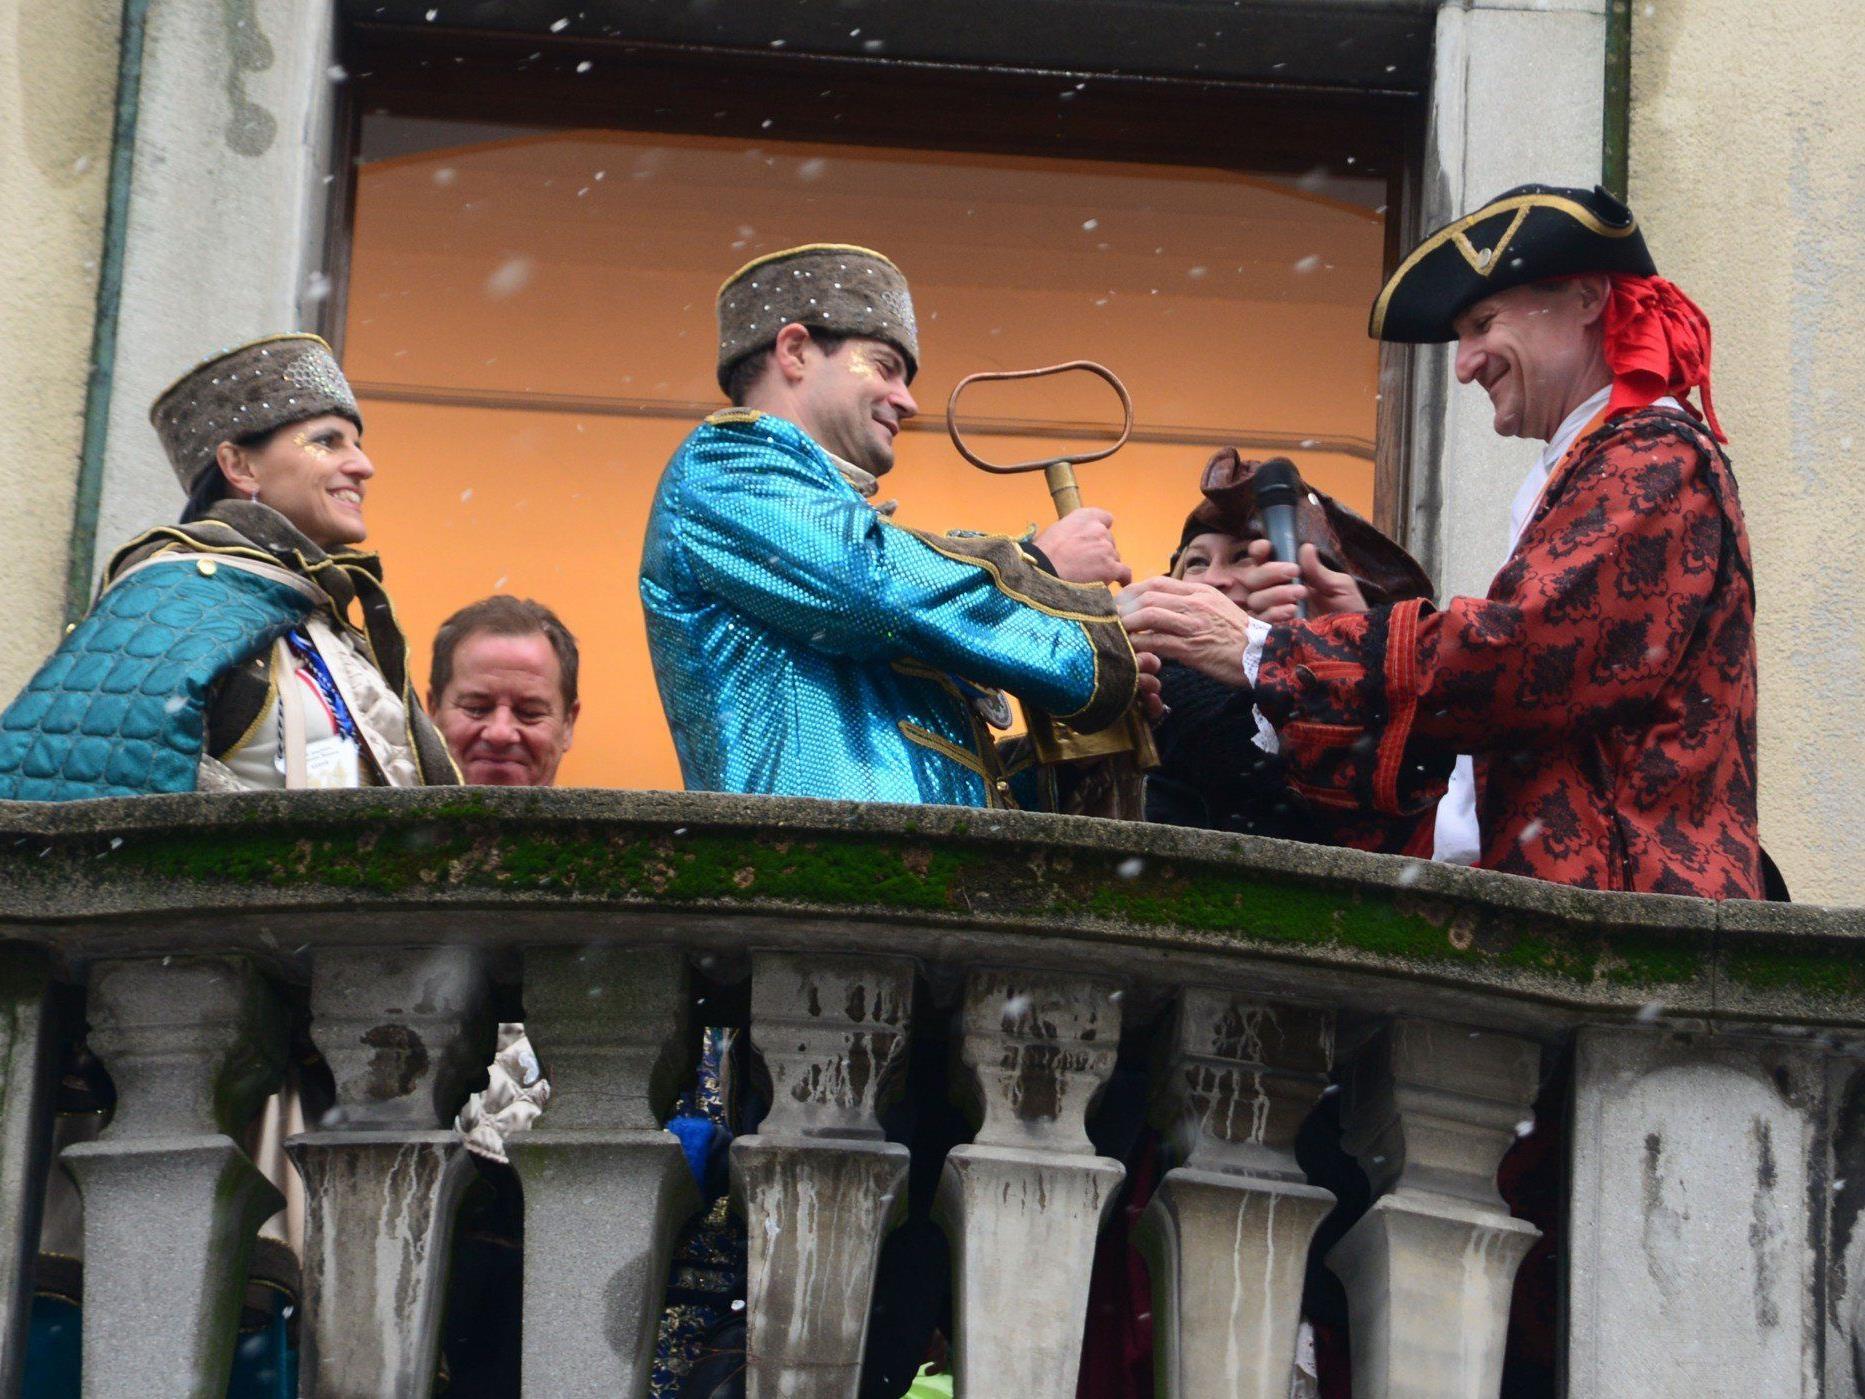 Fast freiwillig übergab Markus Linhart den Stadtschlüssel an das Prinzenpaar.